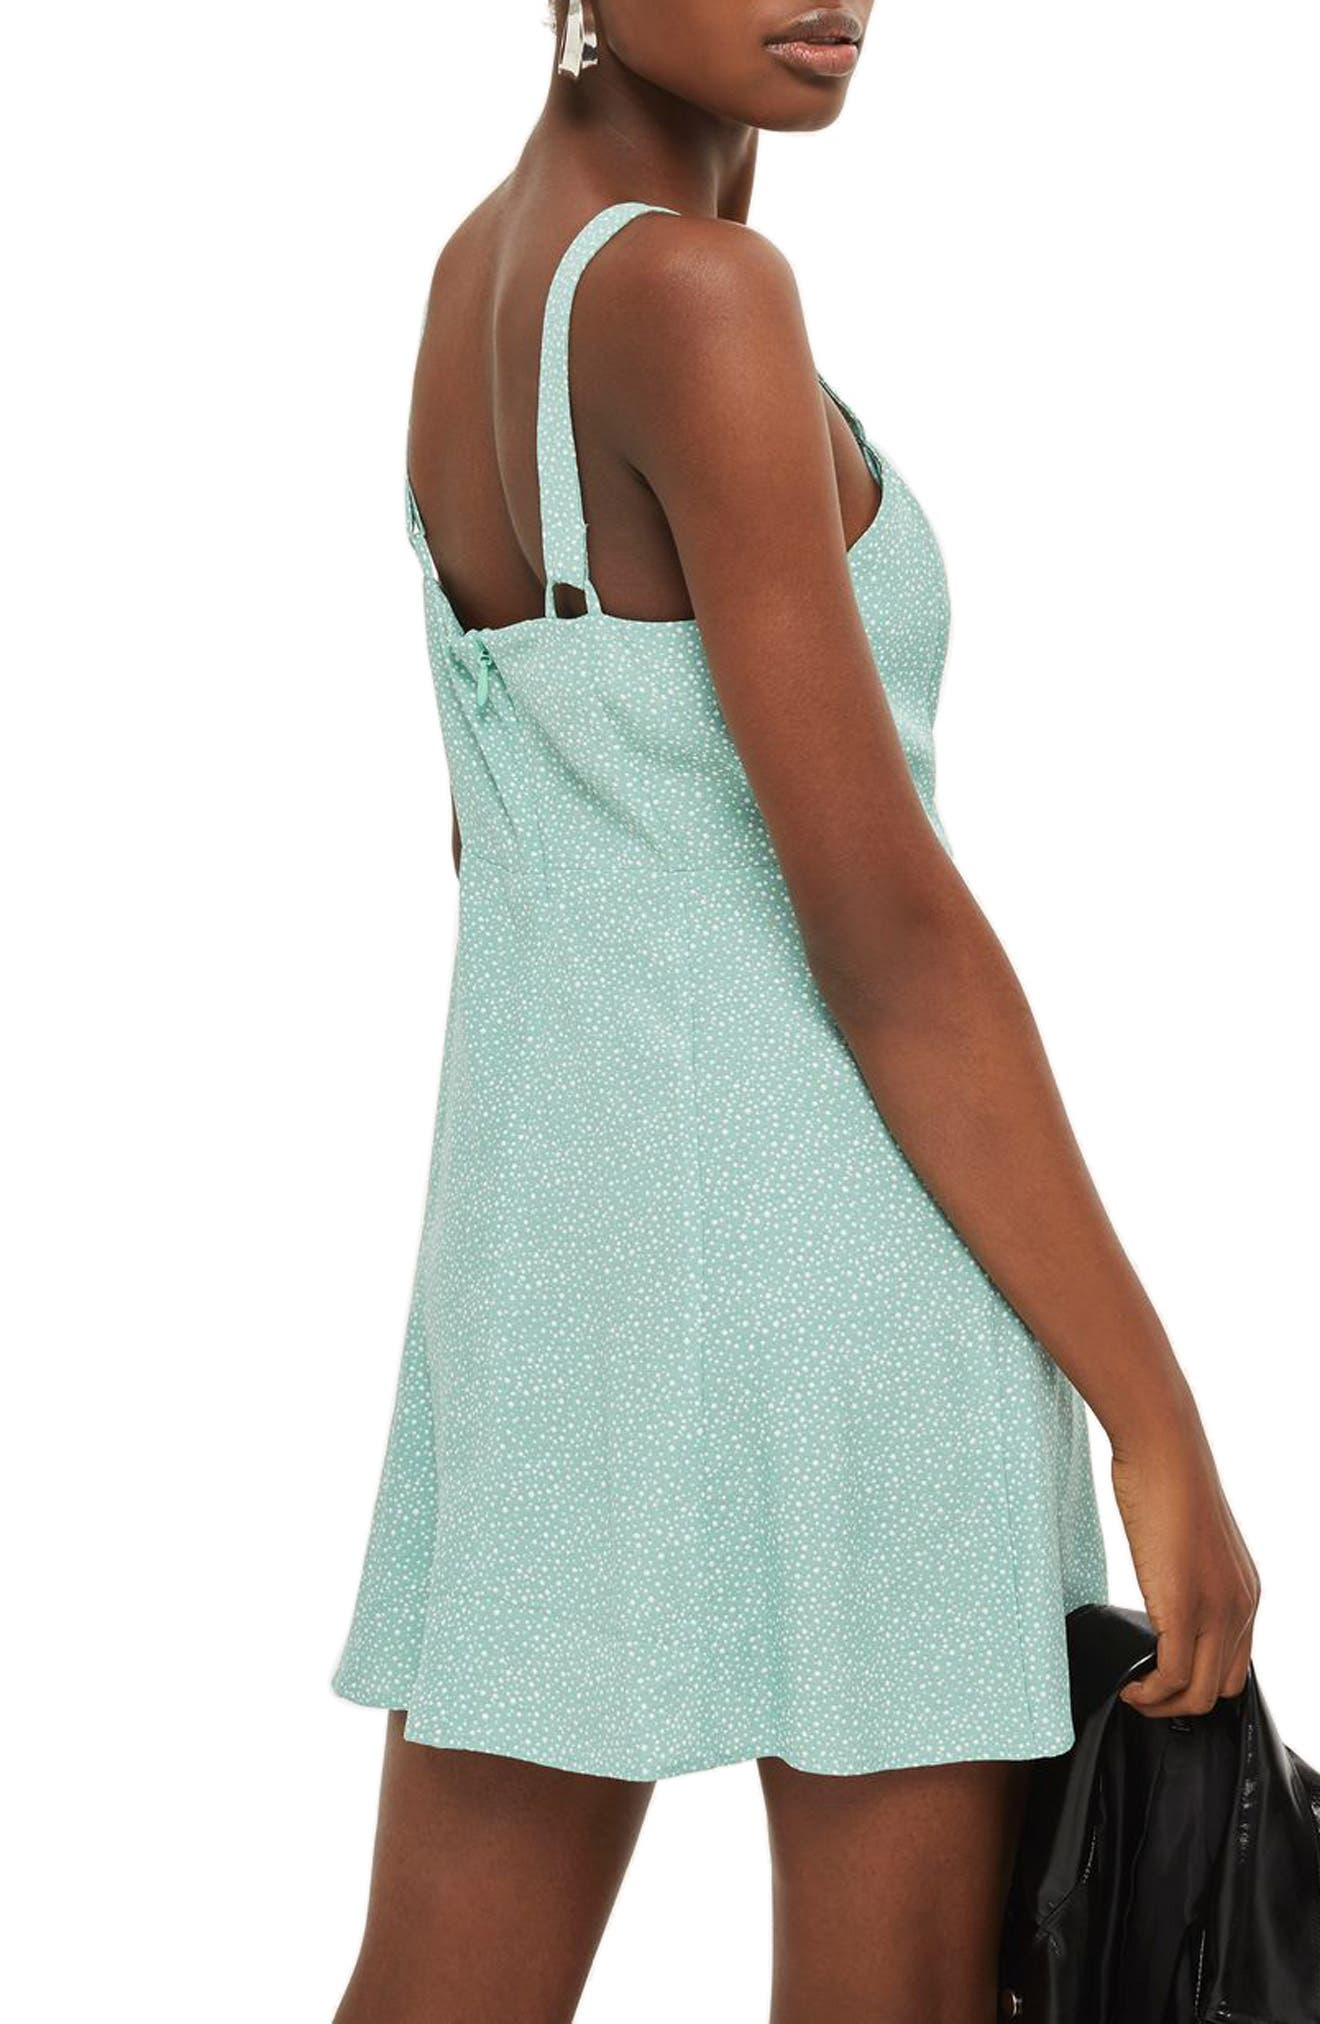 Alternate Image 2  - Topshop Polka Dot Lace-Up Minidress